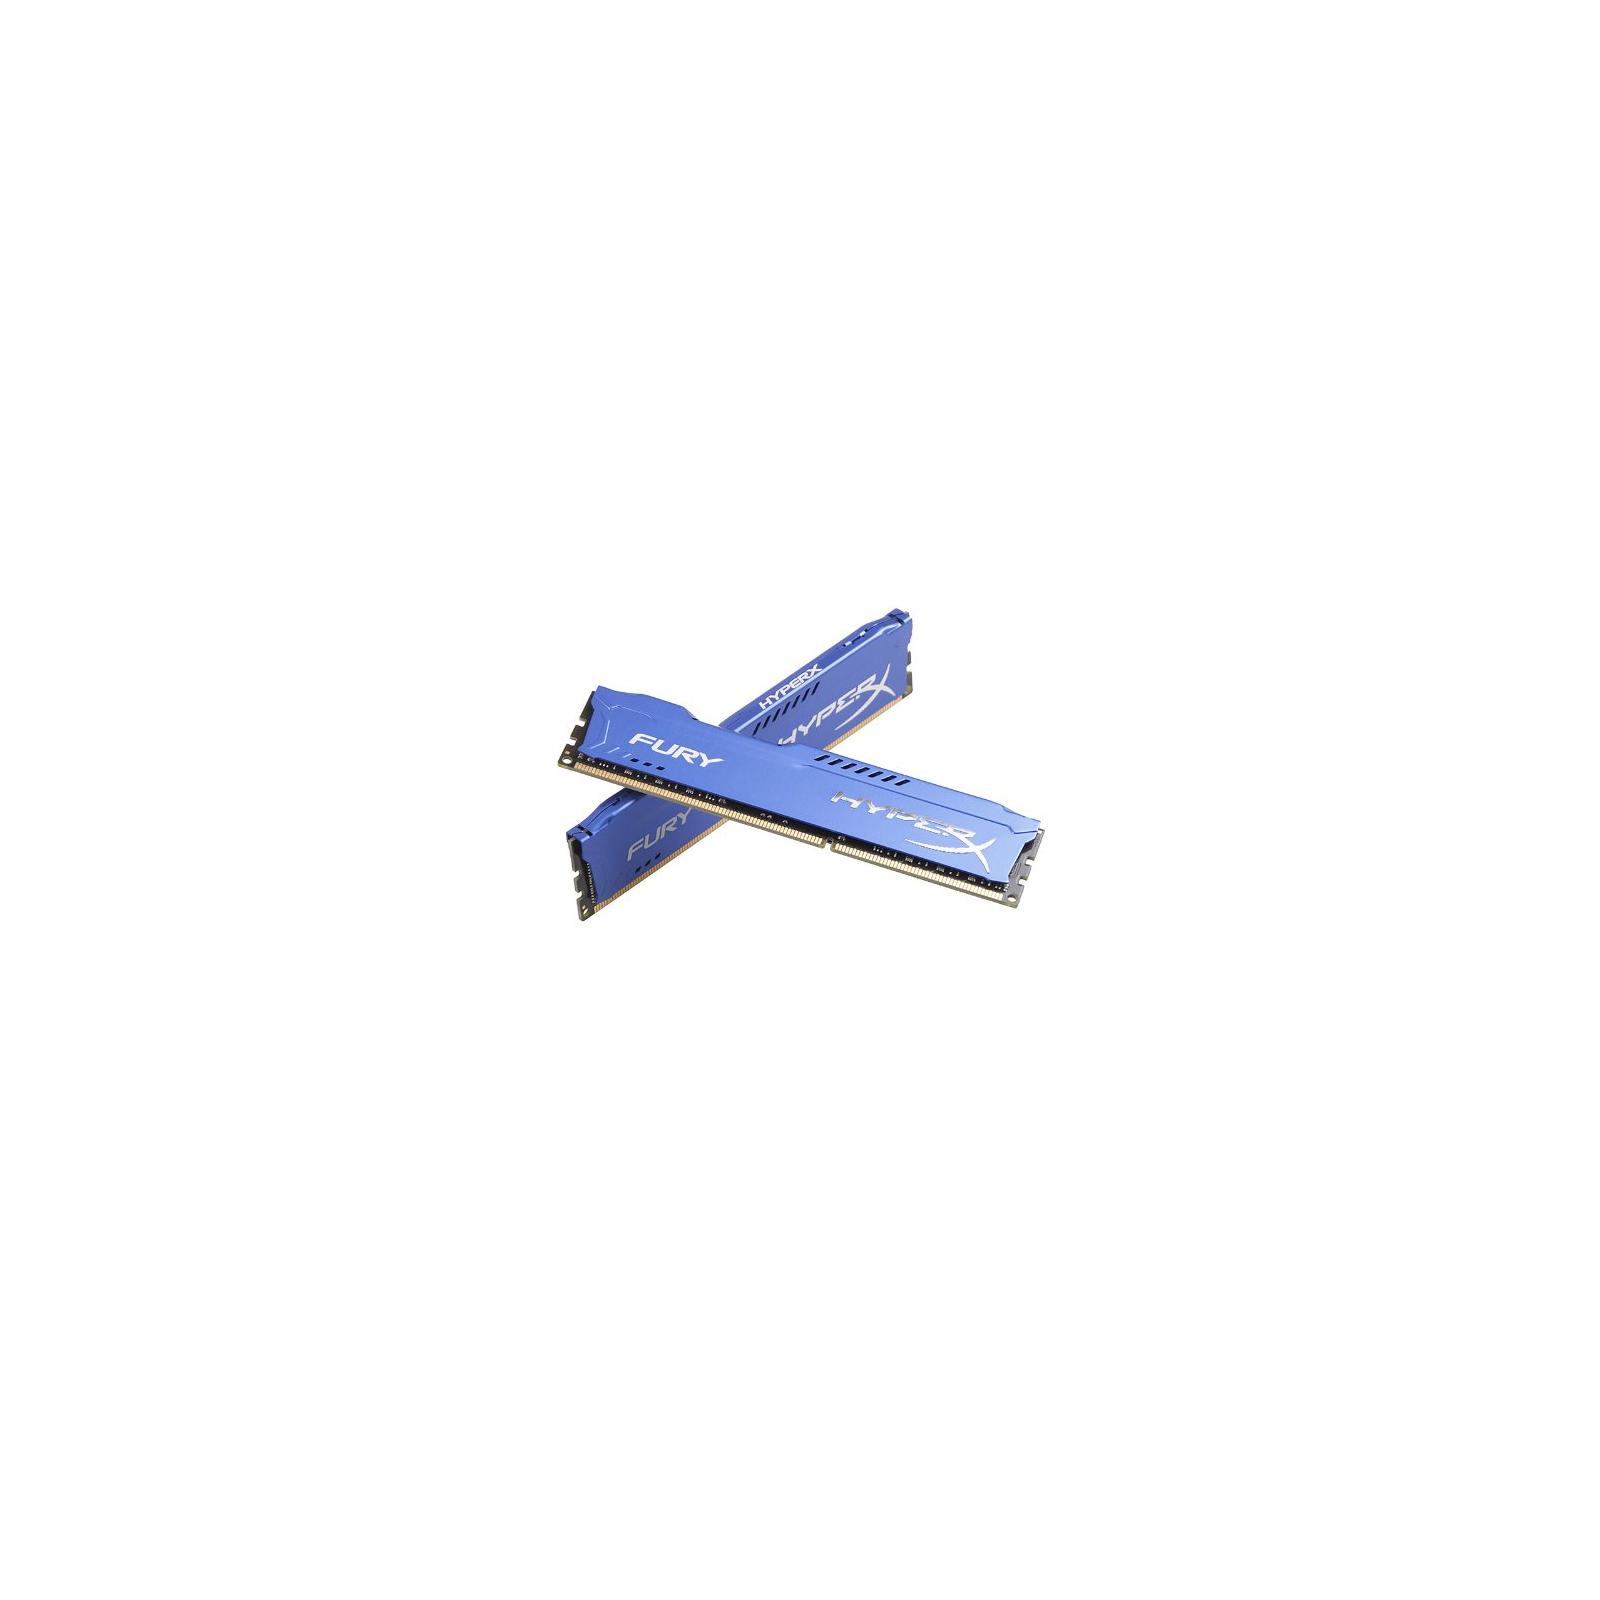 Модуль памяти для компьютера DDR3 16Gb (2x8GB) 1866 MHz HyperX Fury Blu Kingston (HX318C10FK2/16) изображение 3